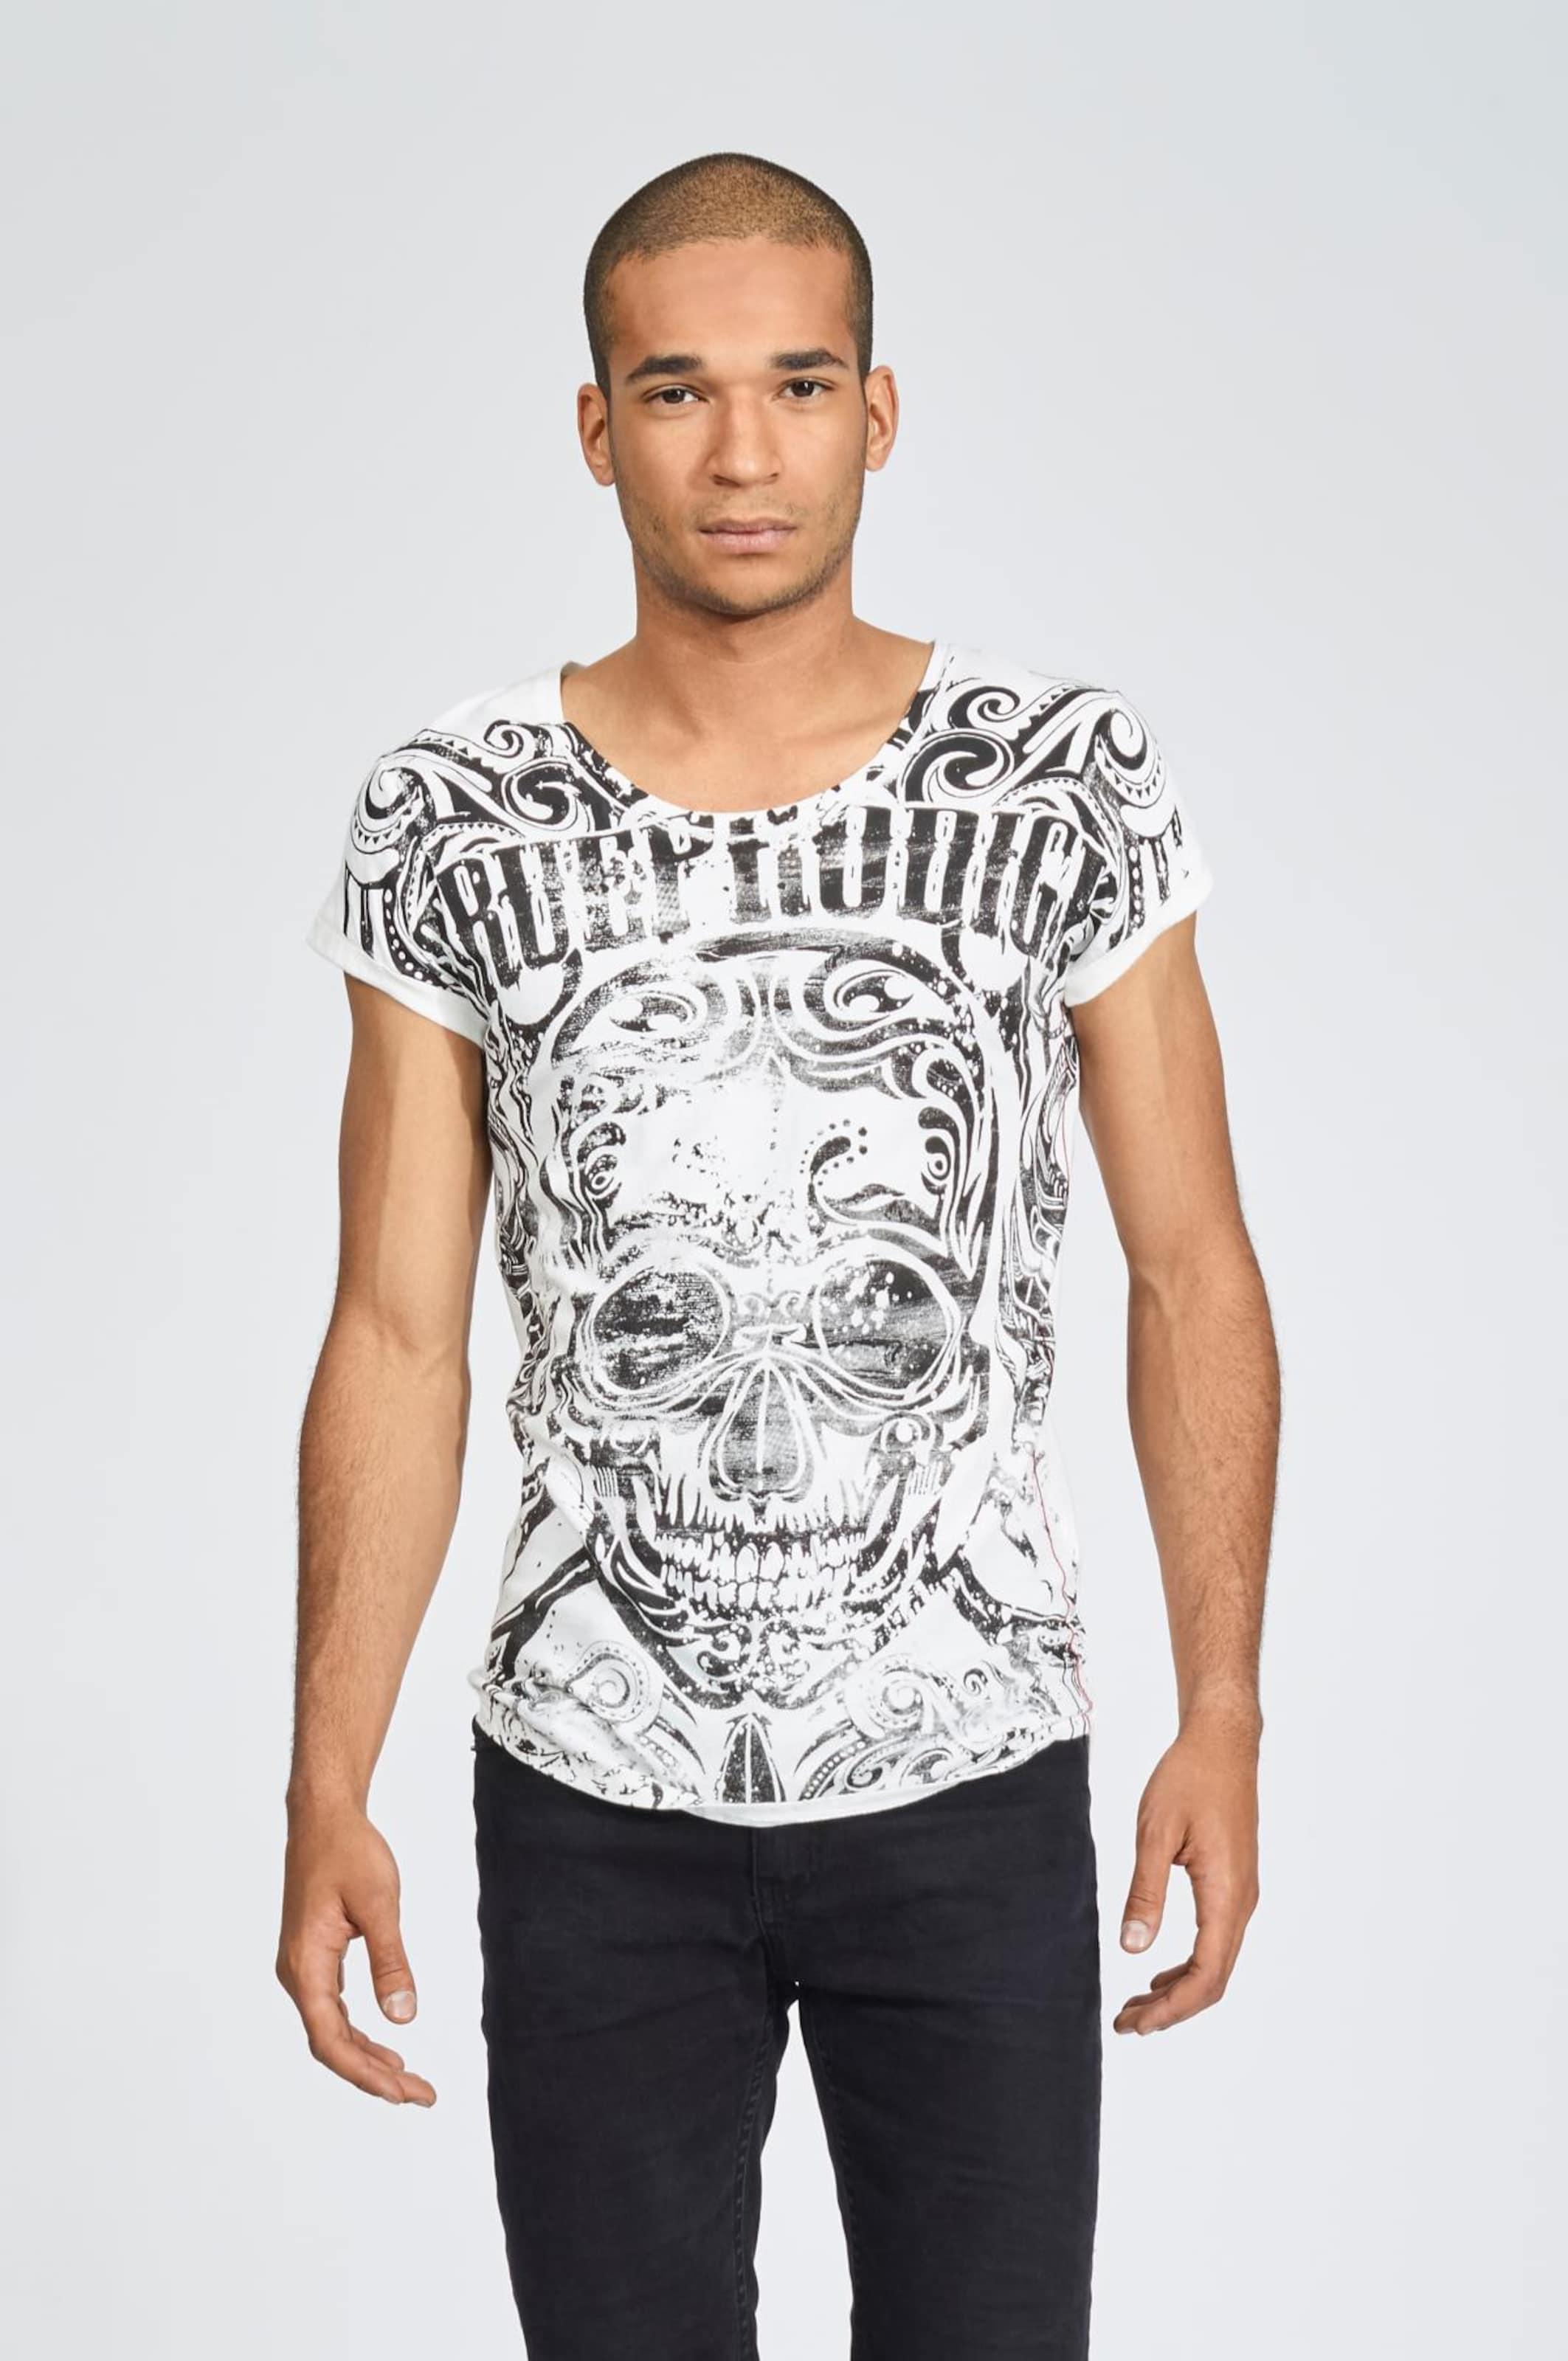 SchwarzNaturweiß In 'black shirt Trueprodigy Skull' T qSzMVGUp